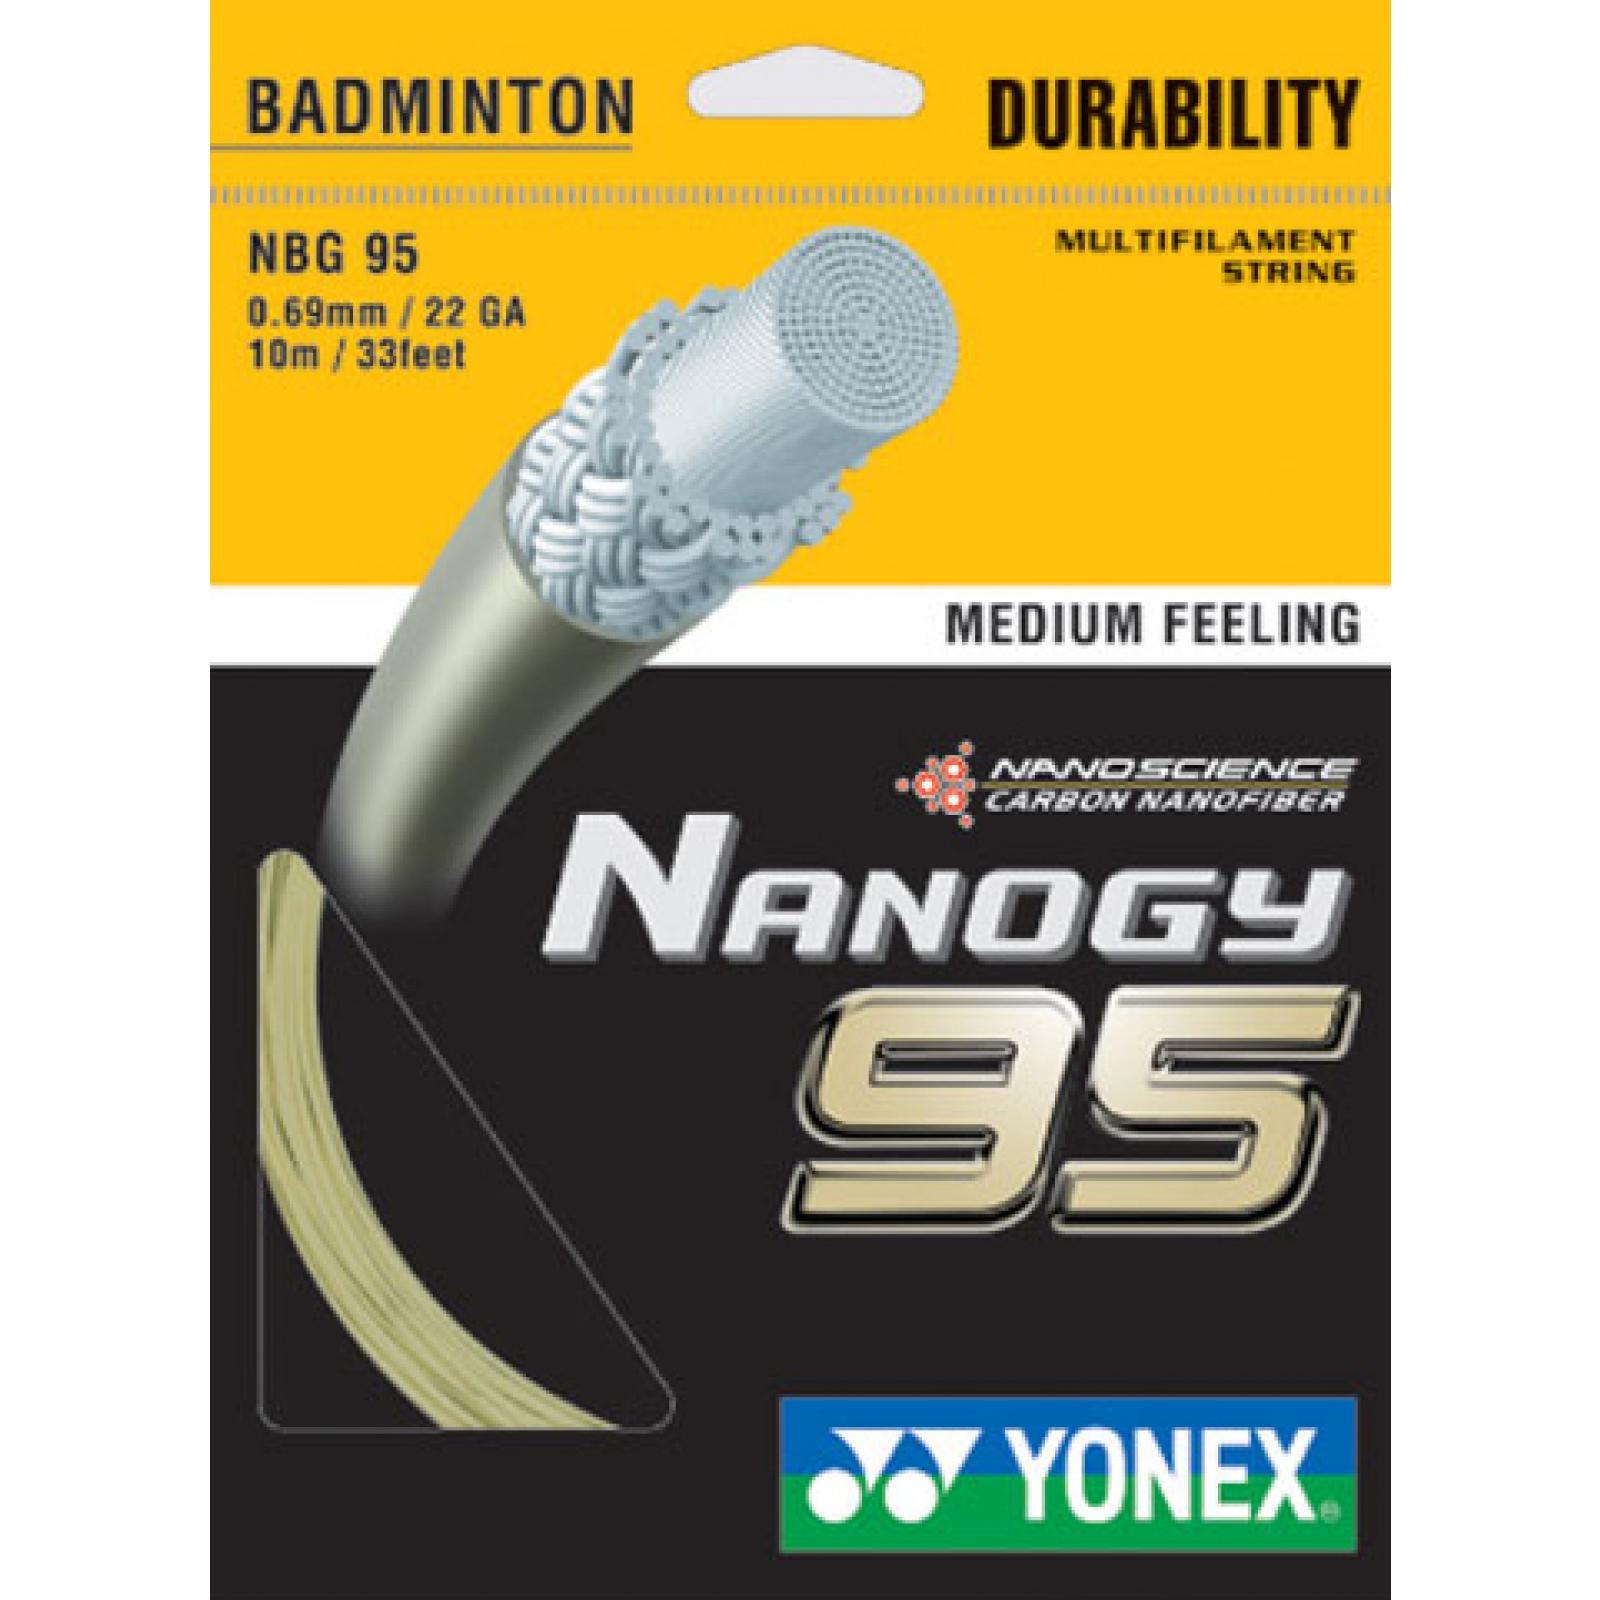 https://www.badec.store/produkty_img/badmintonovy-vyplet1571925227L.jpg